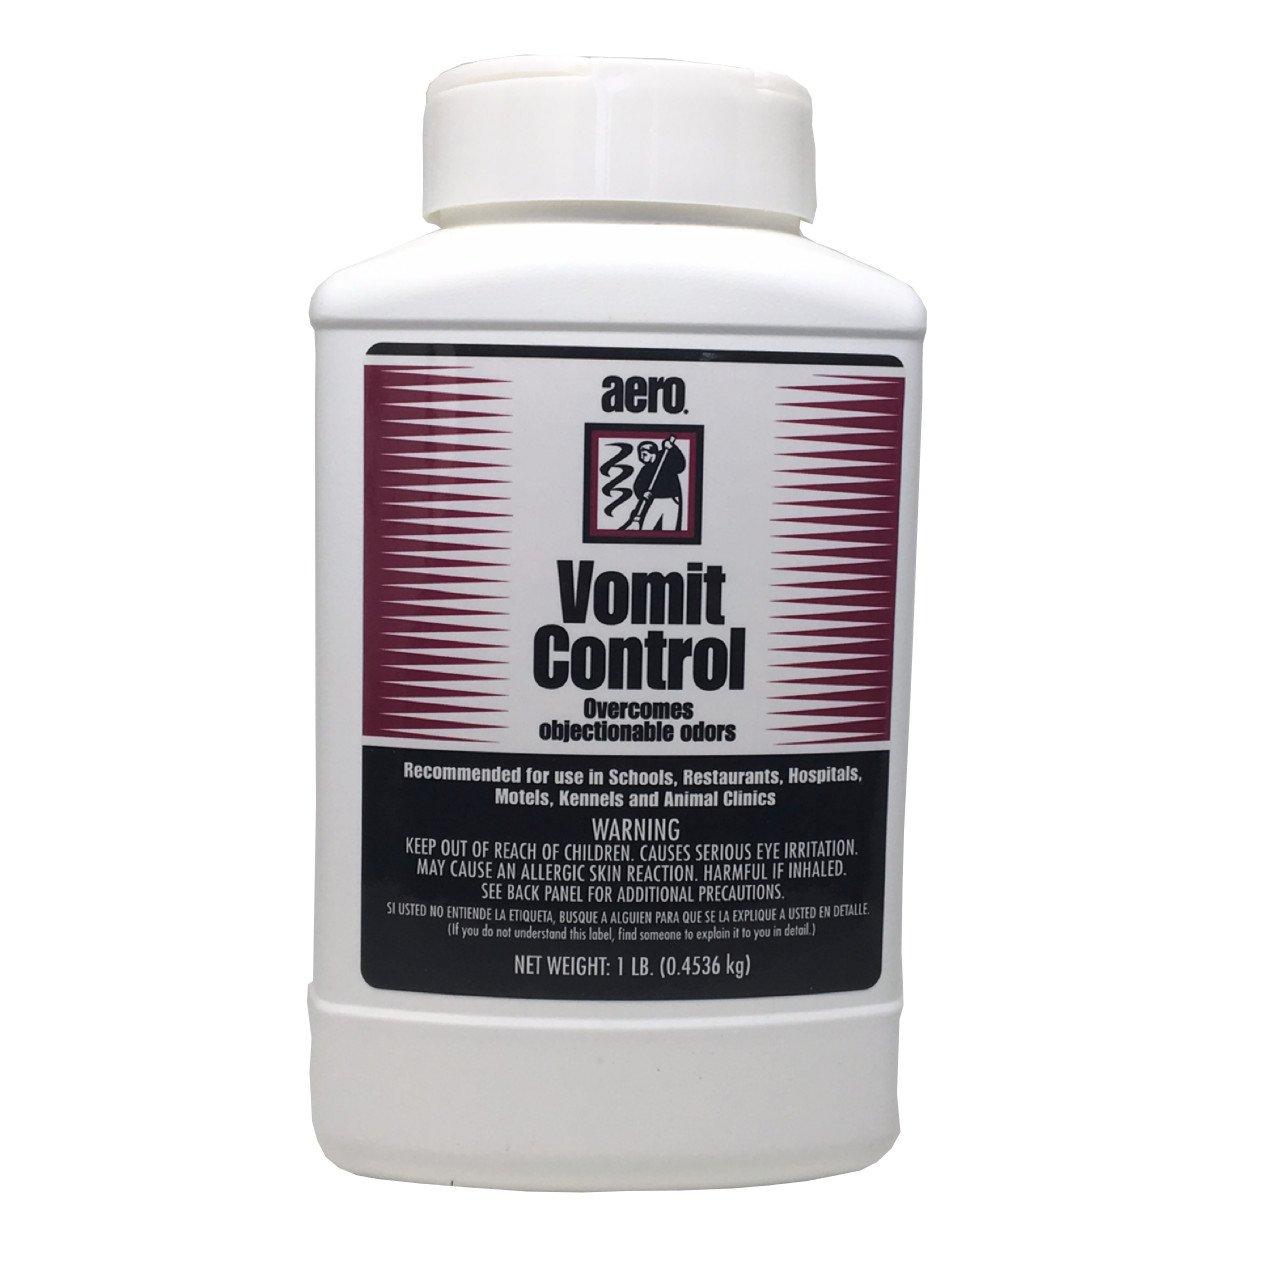 Vomit and Smelly Liquid Absorbent and Deodorizer, Vomit Control Granular, 1 lb Bottle (4 Bottles)